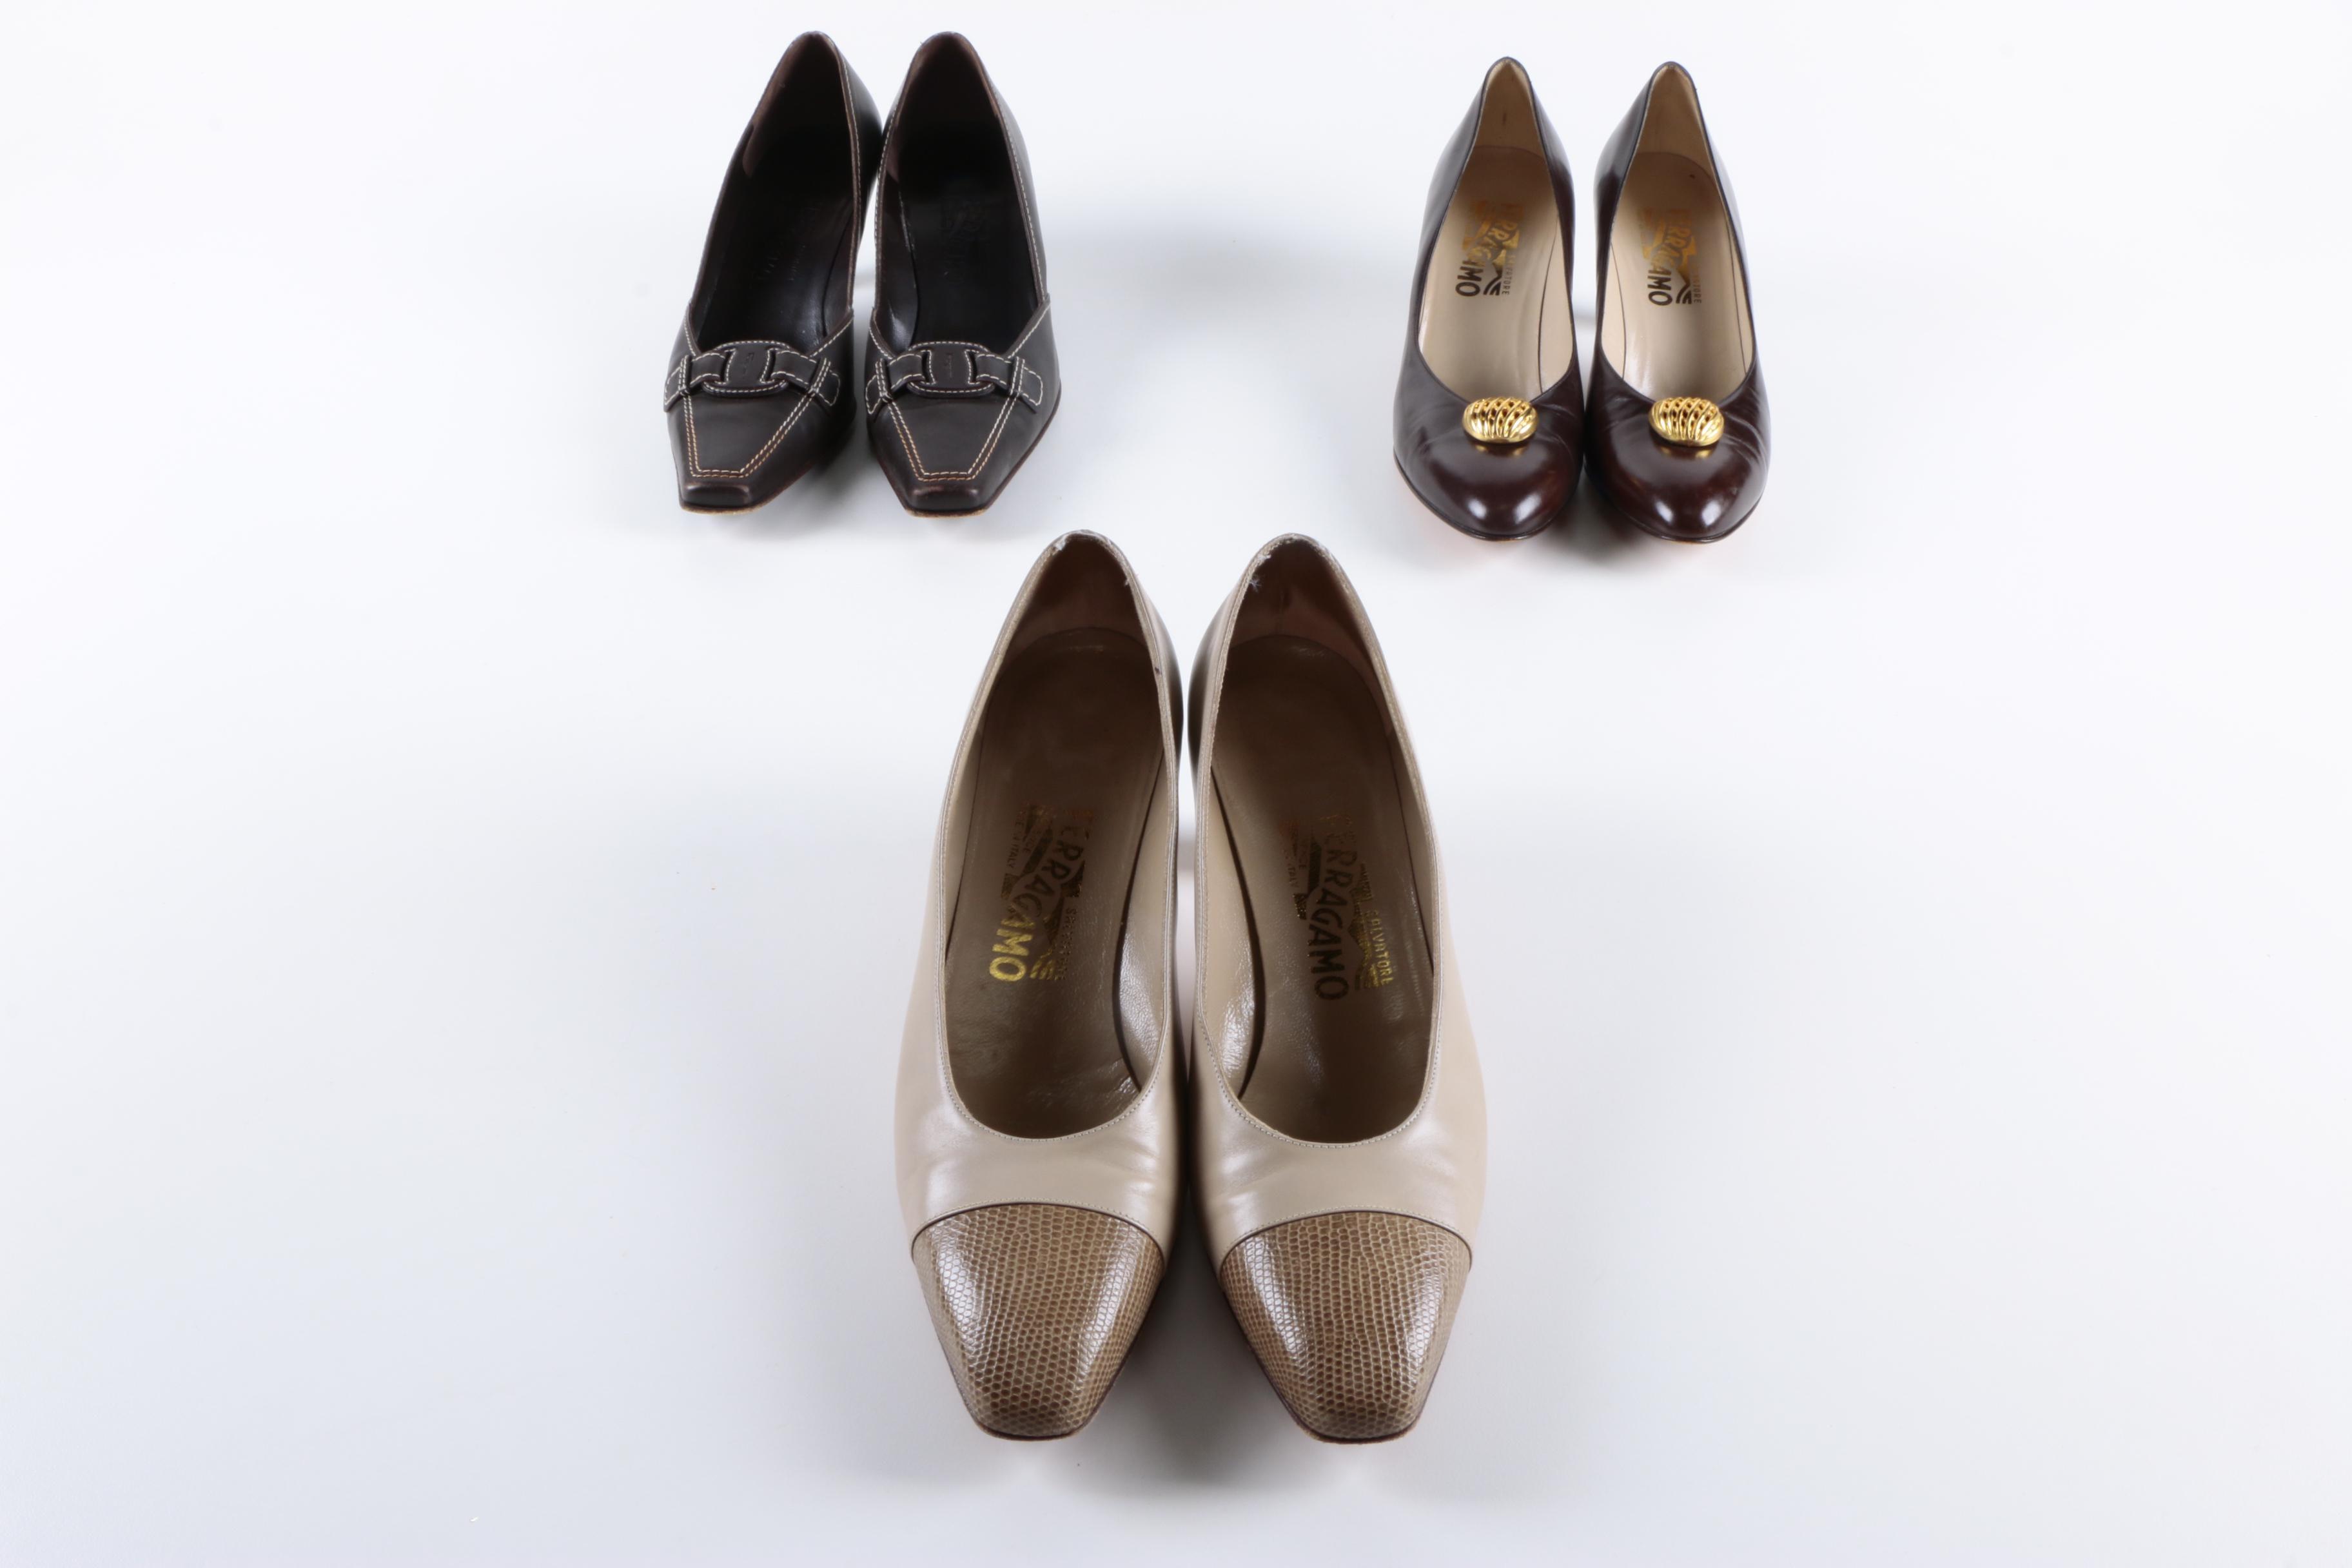 Vintage Salvatore Ferragamo High Heels